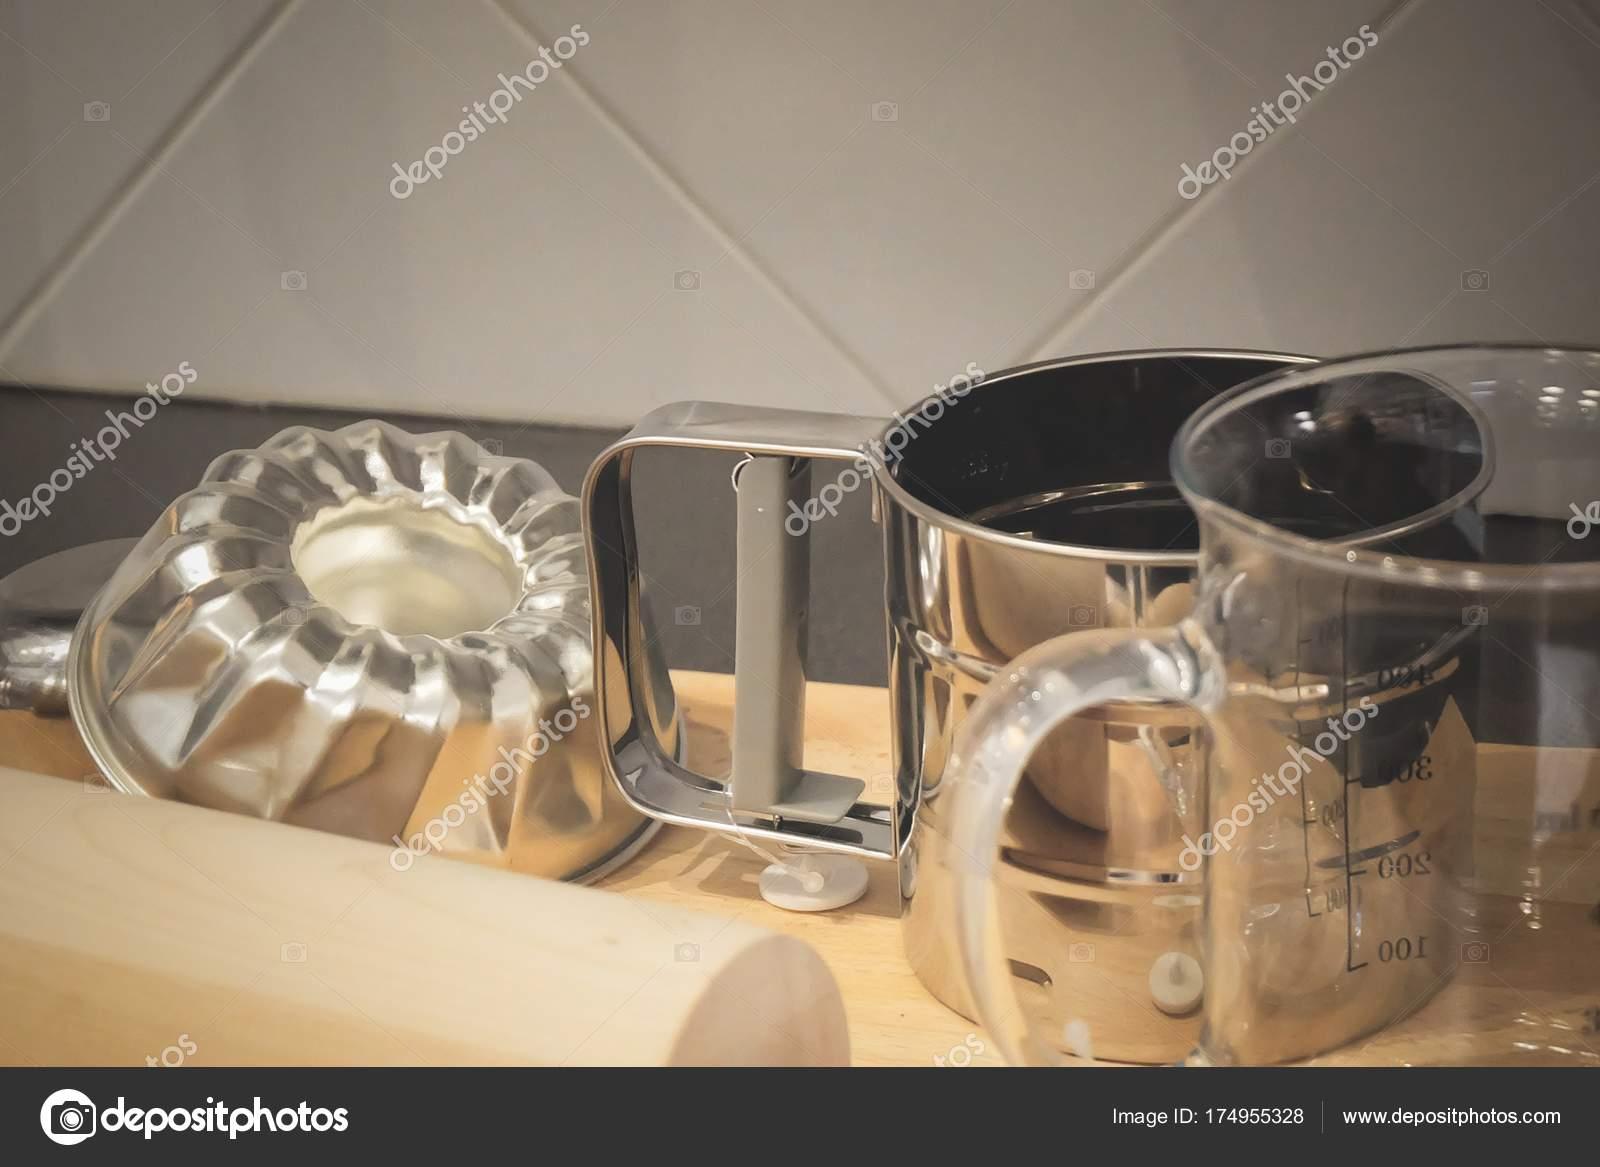 wood mode kitchens craftsman kitchen backsplash 木制的擀面杖 量杯和蛋糕模 图库照片 c arayabandit 174955328 厨房用具 木擀面杖与玻璃量杯和蛋糕模具上用于制作烘焙产品木制切菜板 照片作者arayabandit